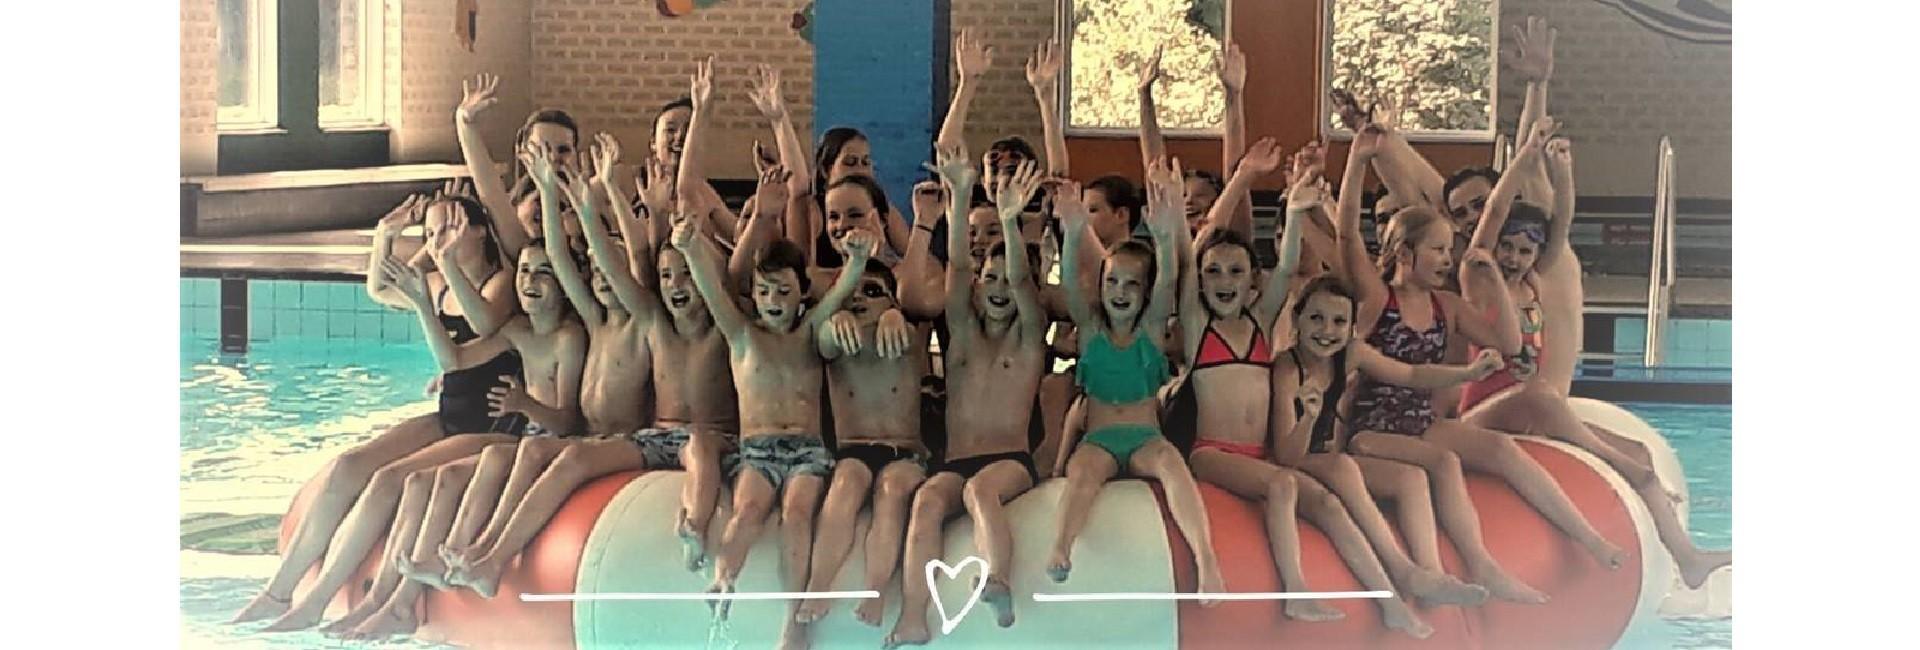 Recreatief zwemmen